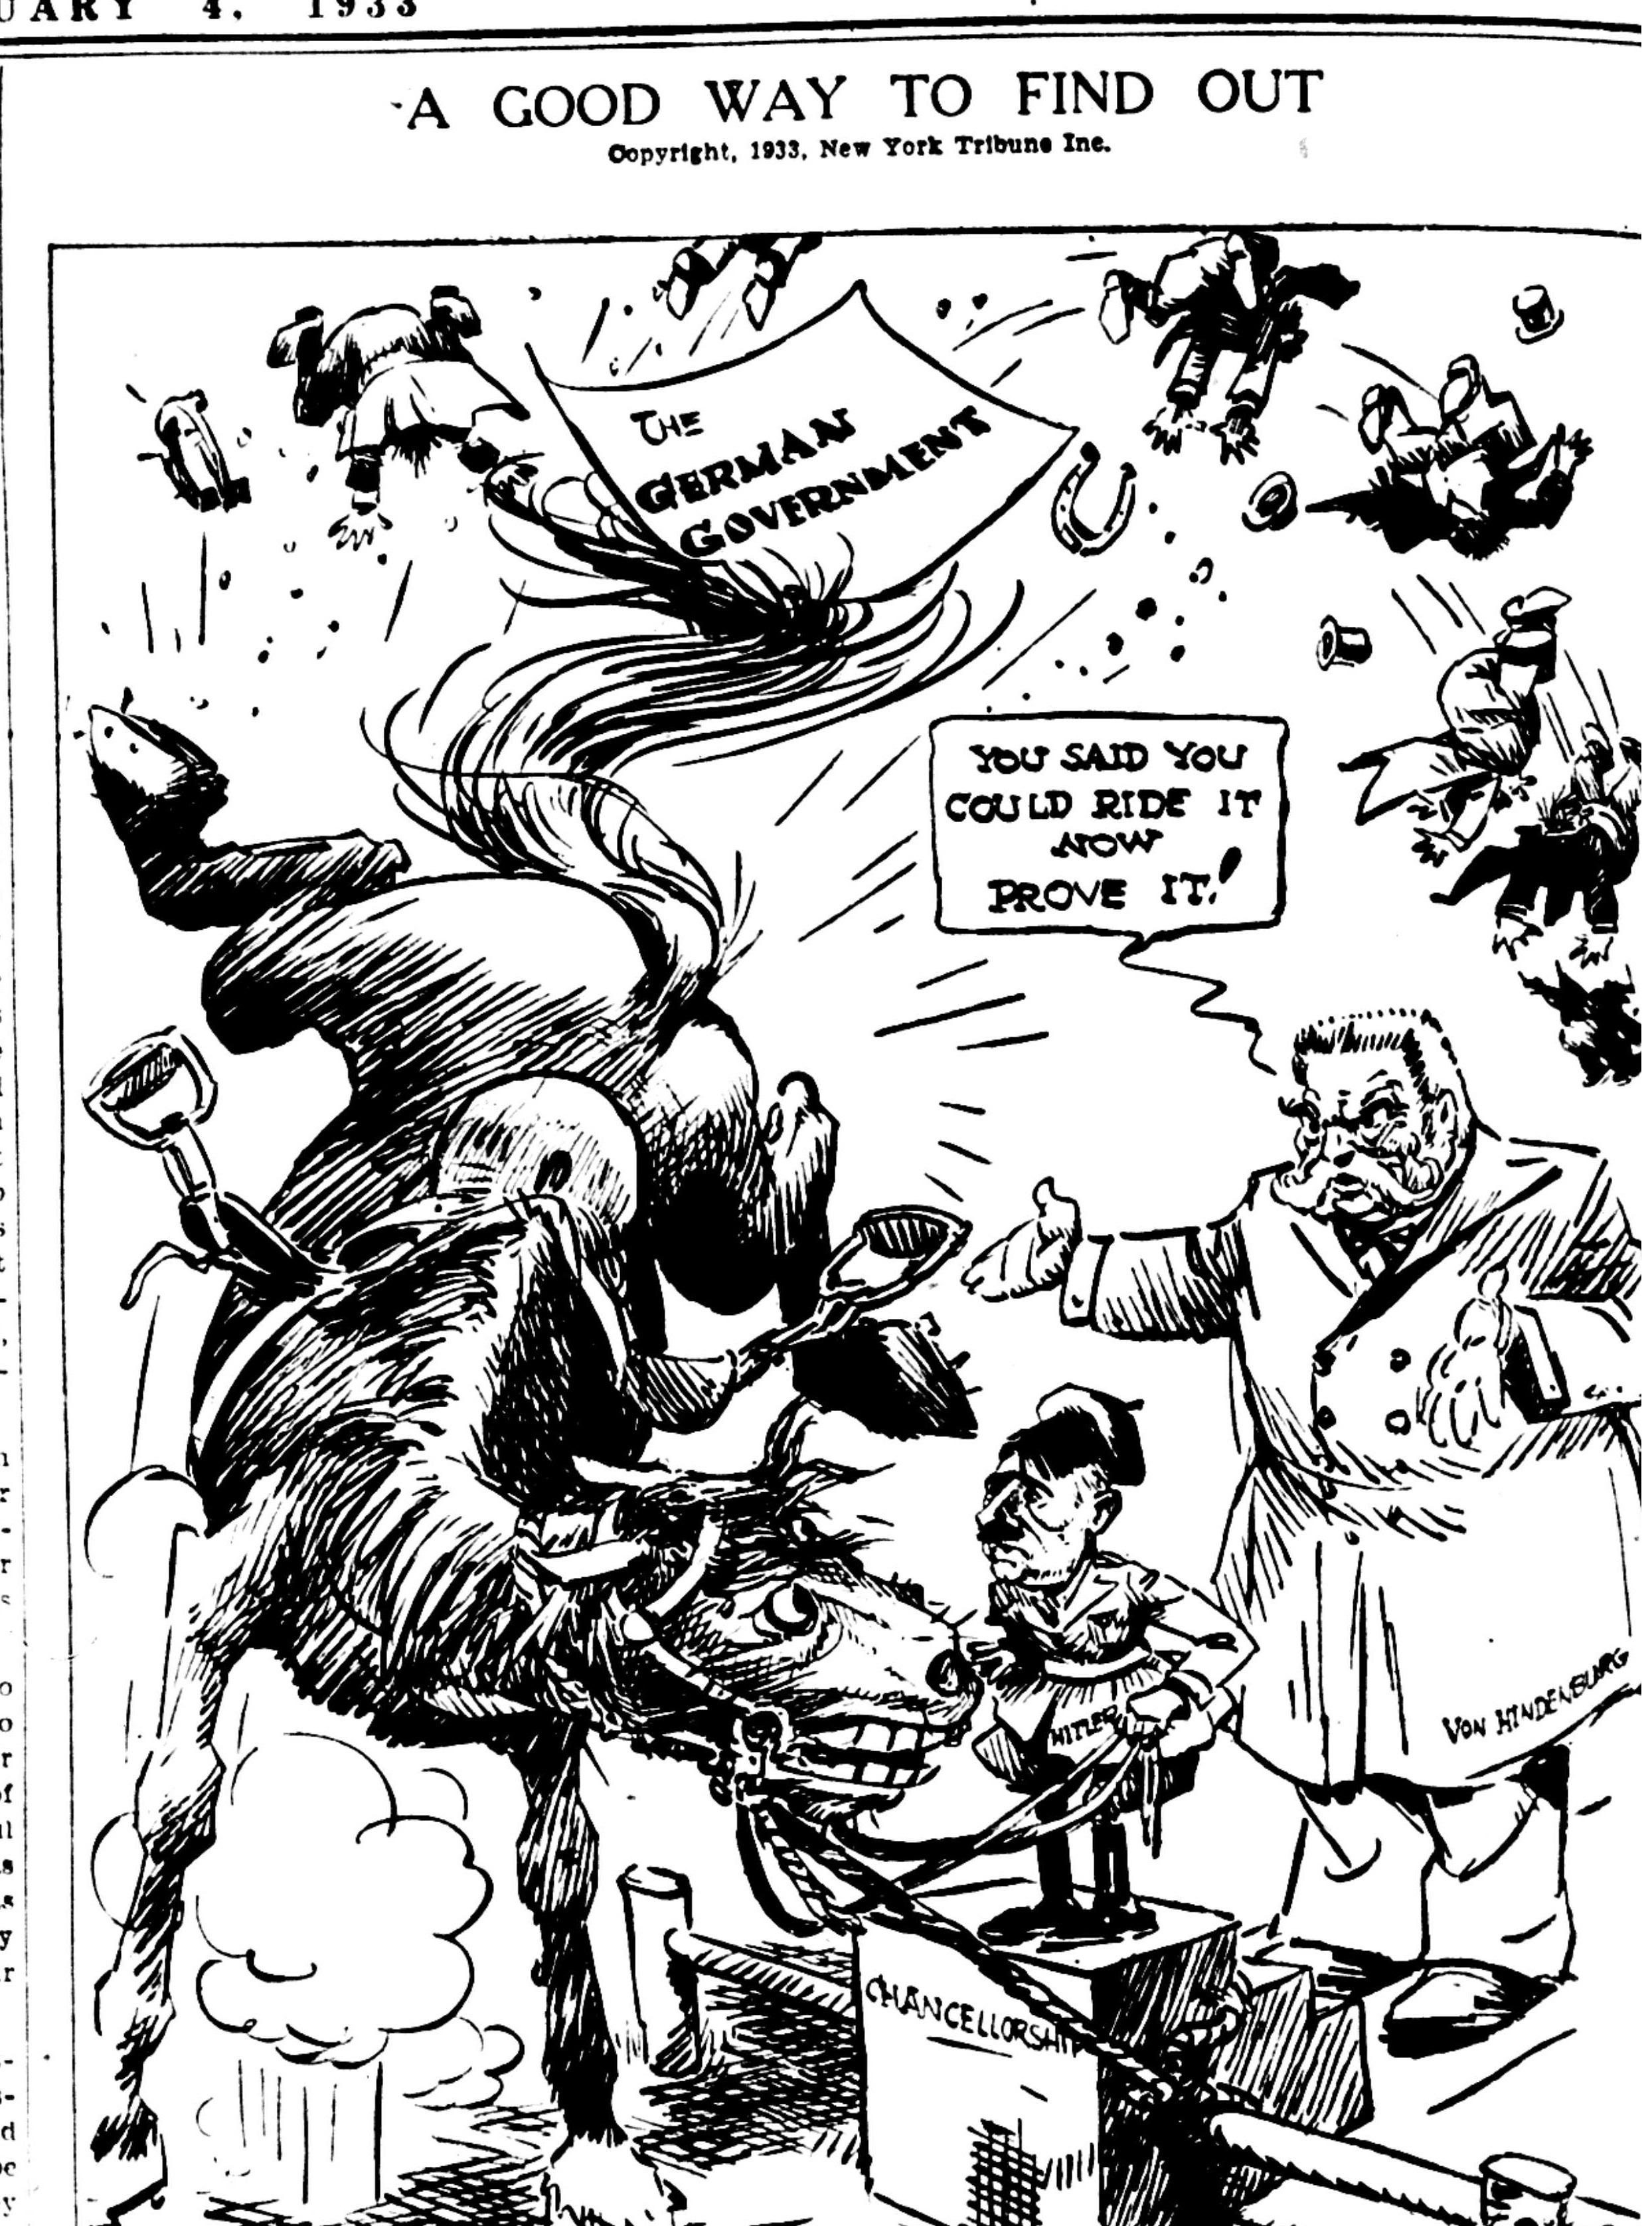 Natzi Jewish Political Cartoons 1930 S